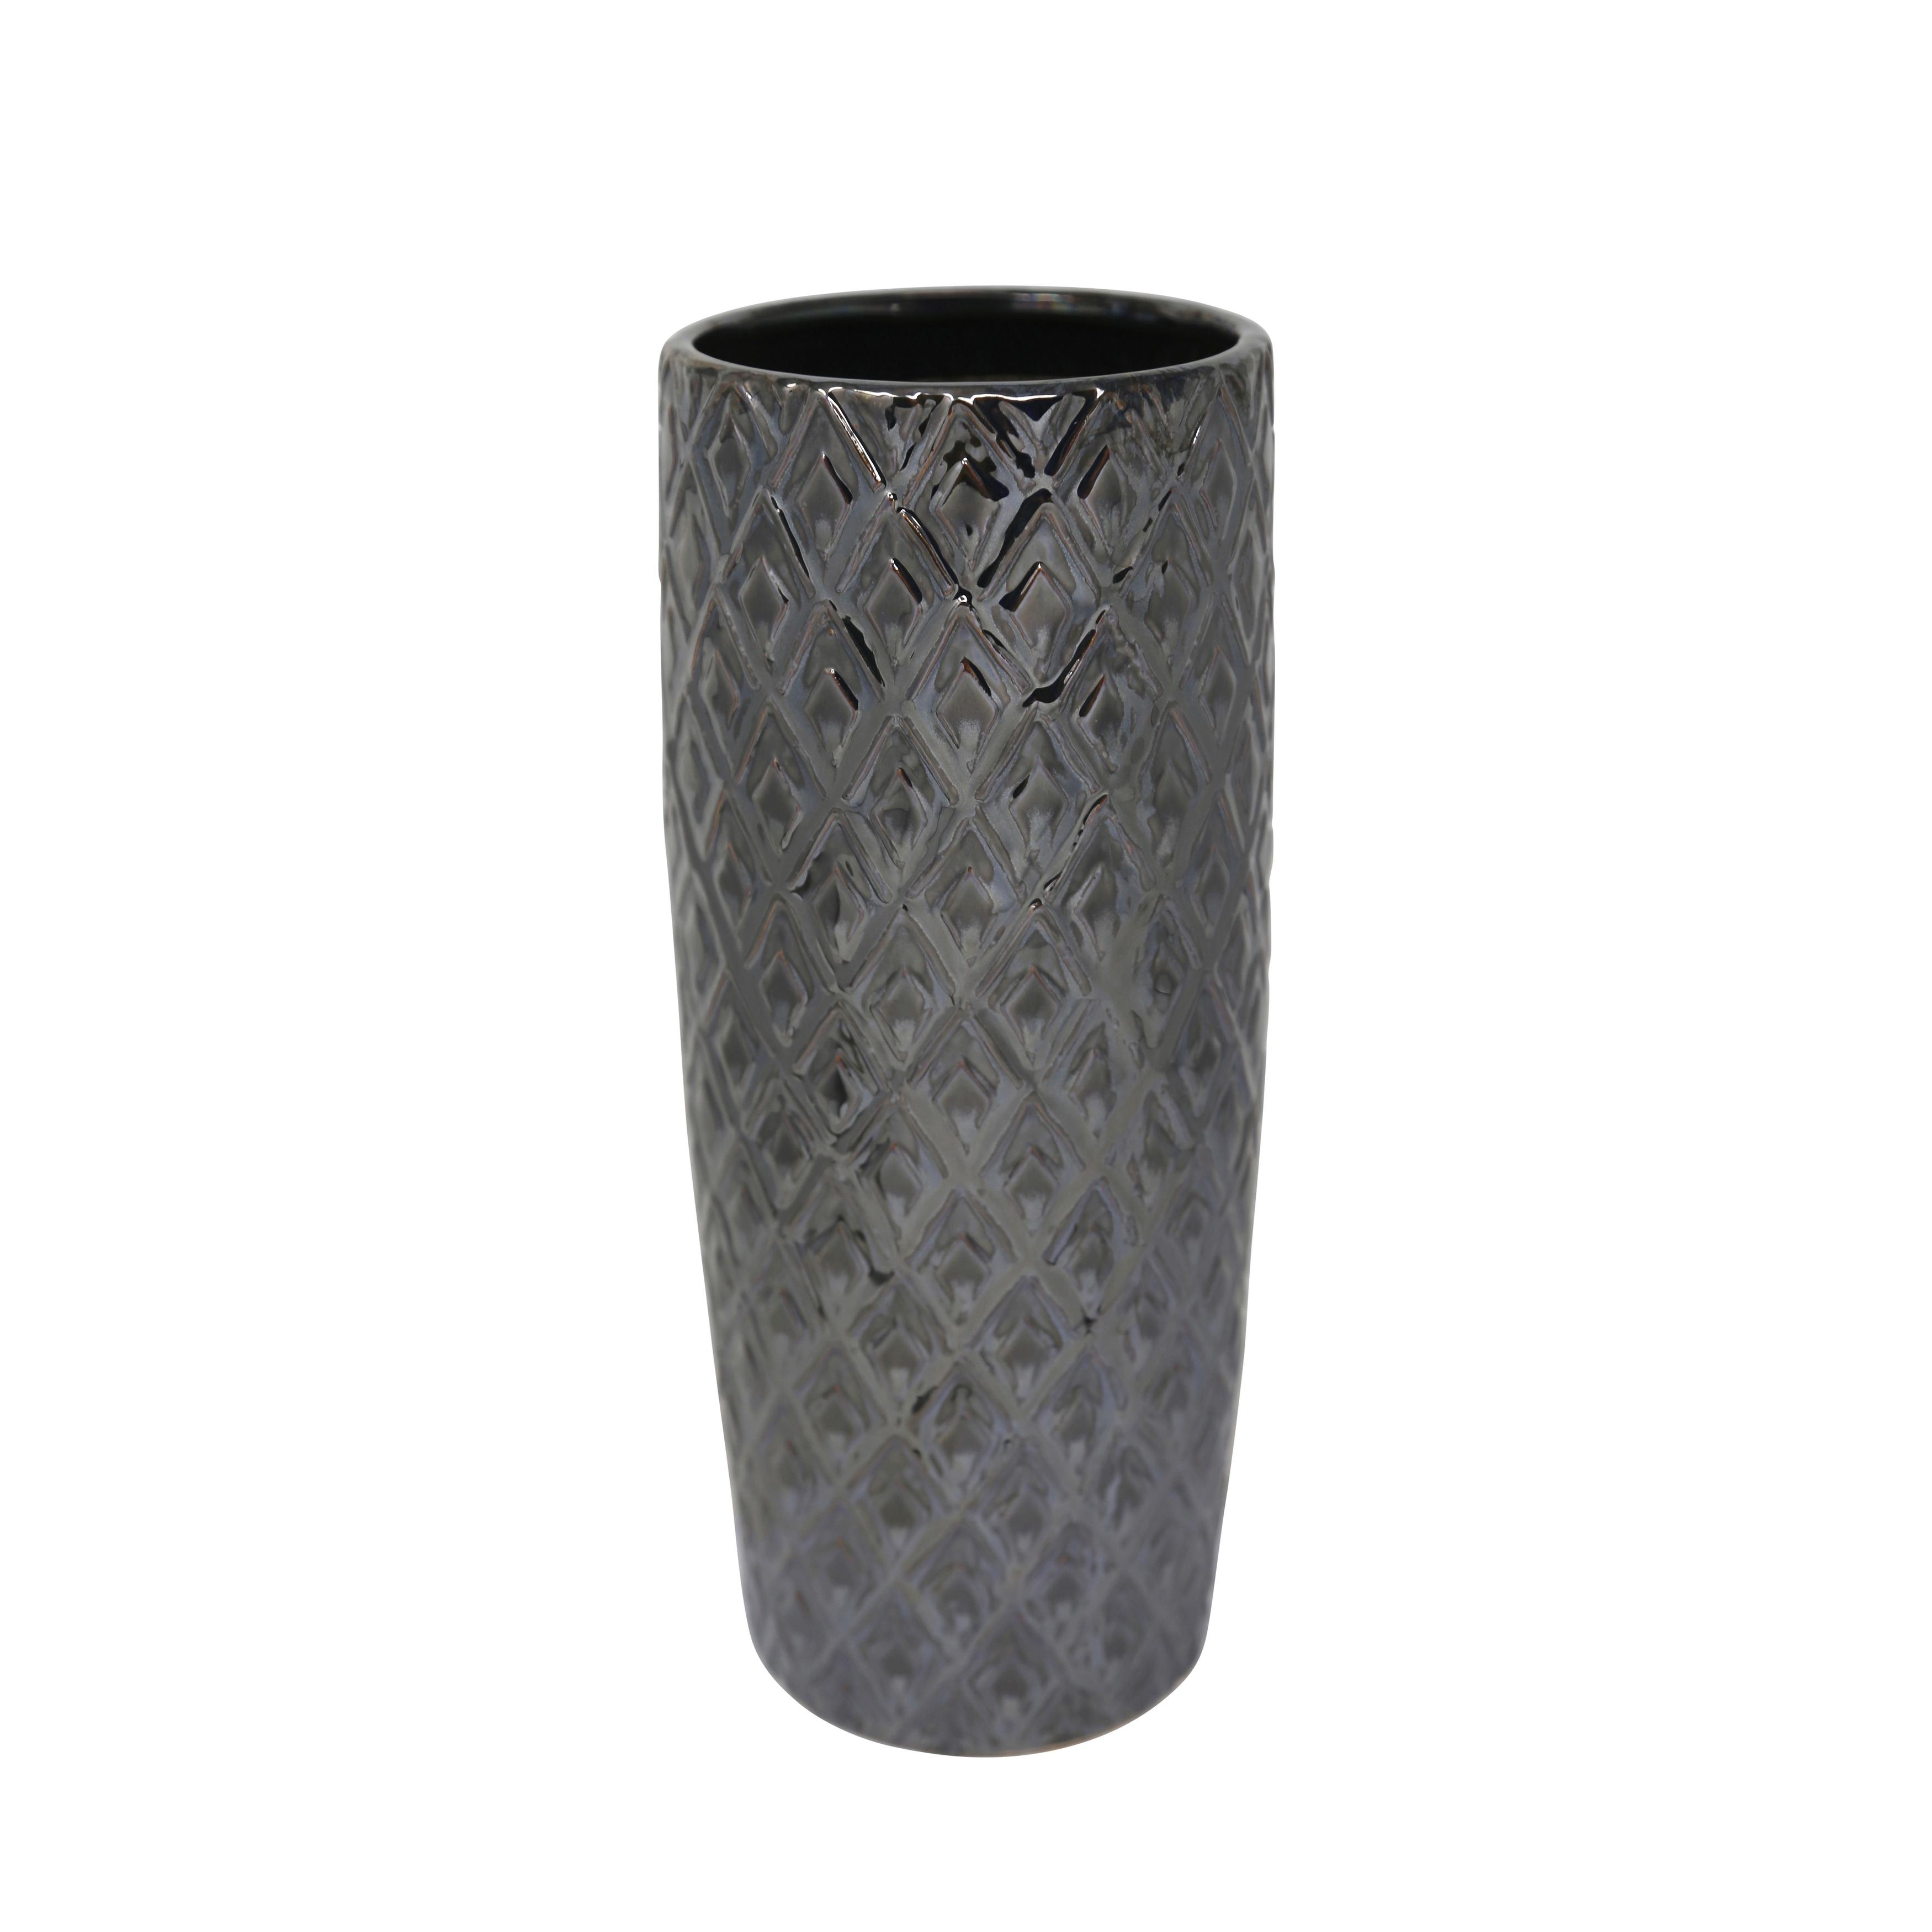 Ceramic Tapered Table Vase with Embossed Diamond Design, Black